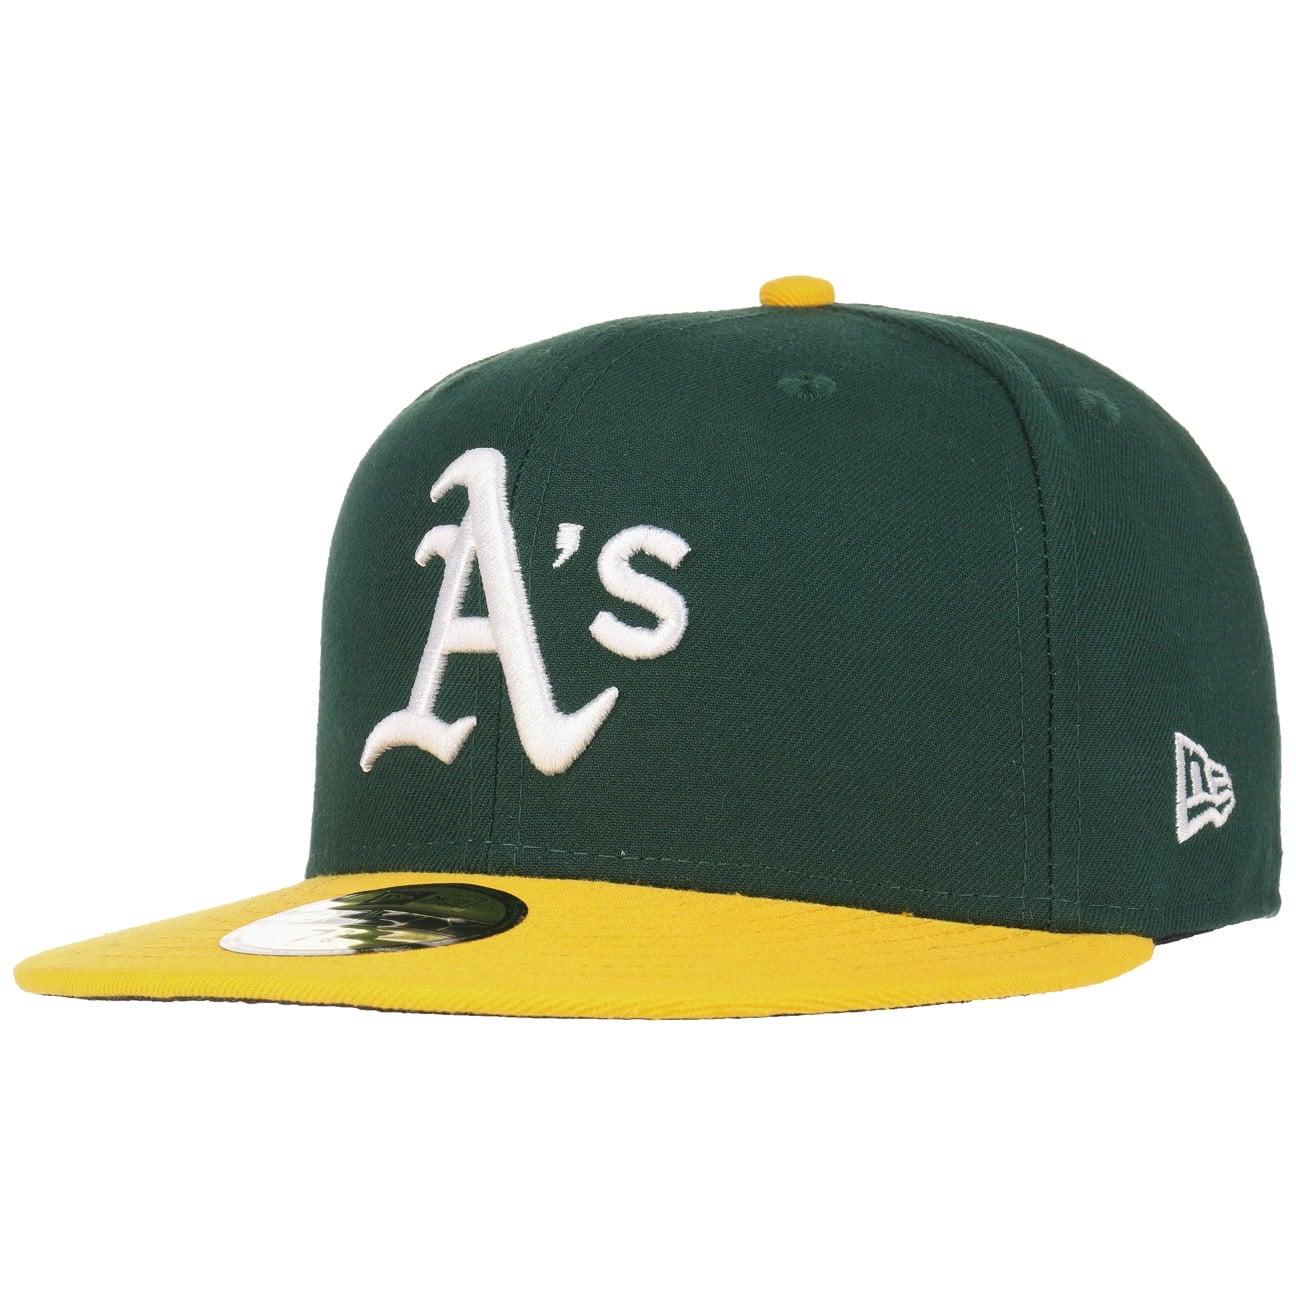 casquette-59fifty-tsf-as-by-new-era-baseball-cap